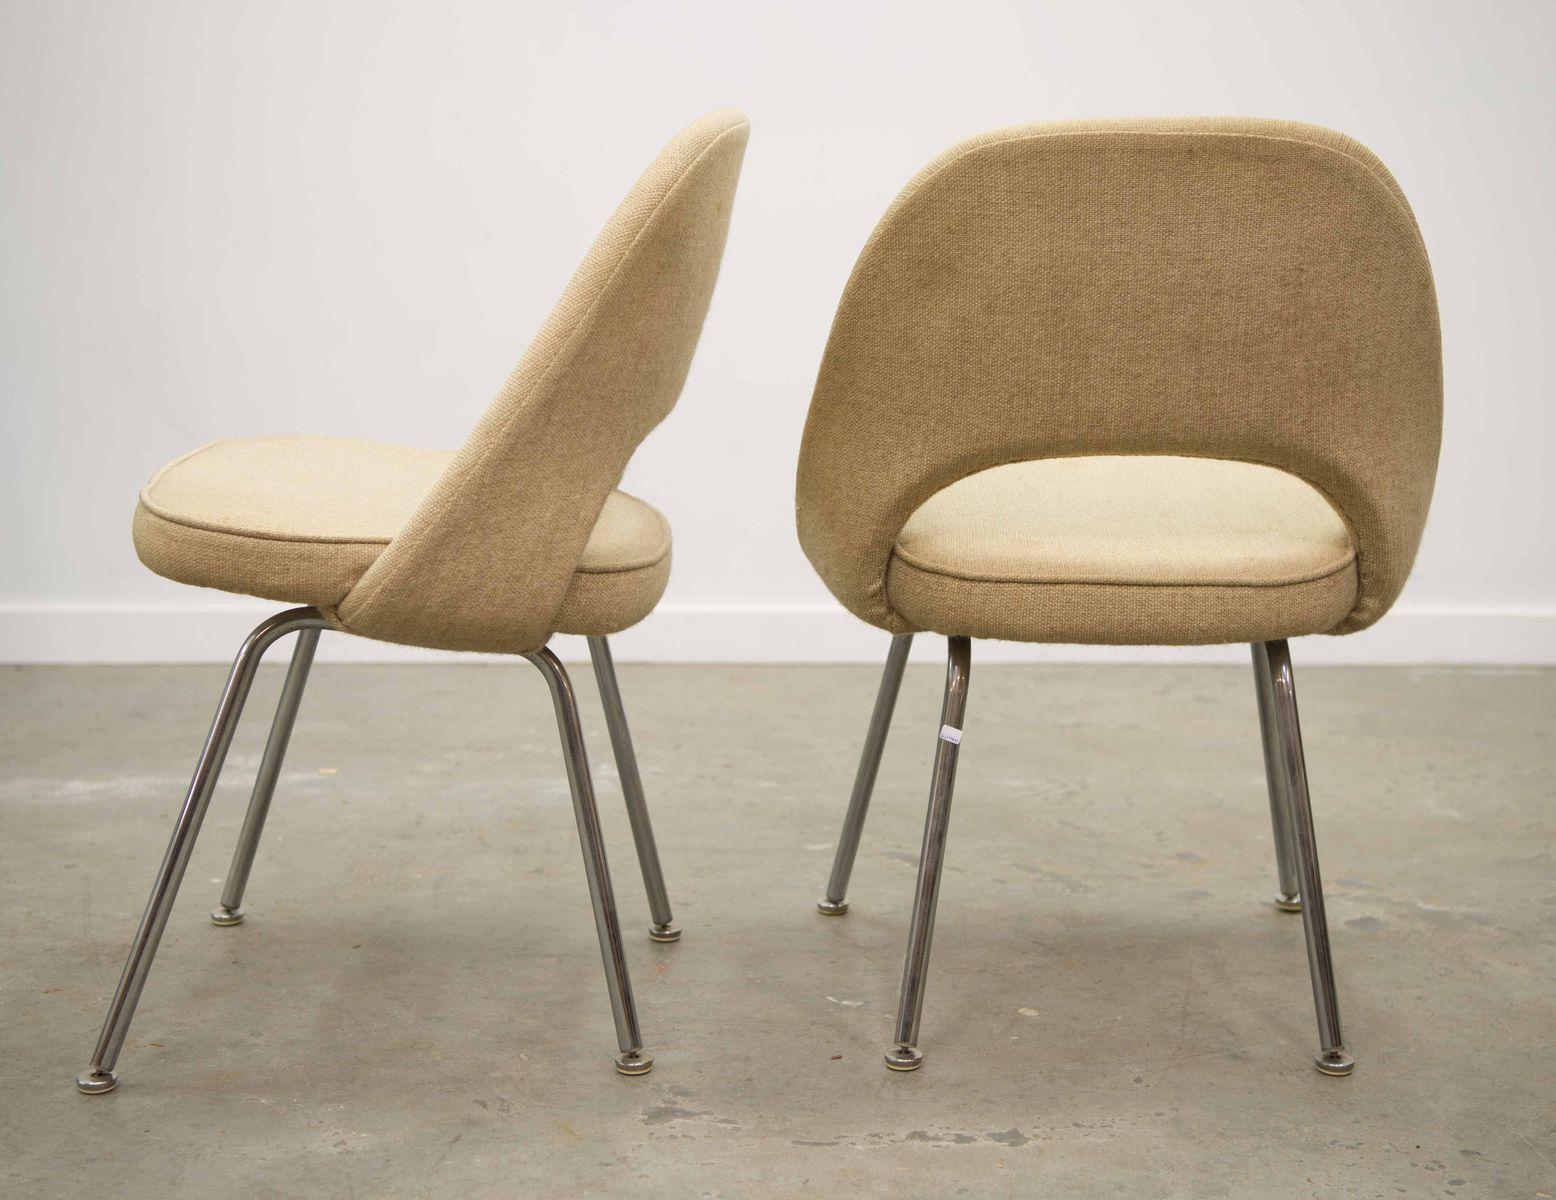 chrome dining chairs australia weird for sale with feet by eero saarinen knoll